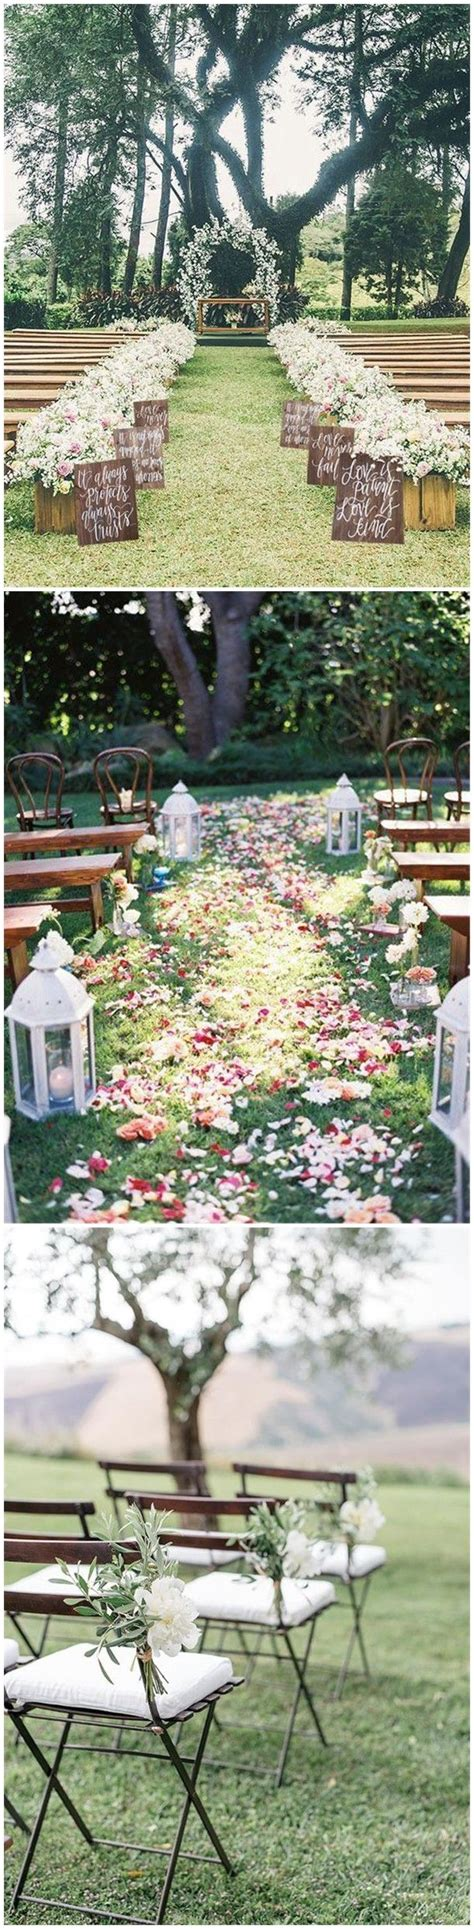 25 rustic outdoor wedding ceremony decorations ideas country weddings 187 25 rustic outdoor wedding ceremony